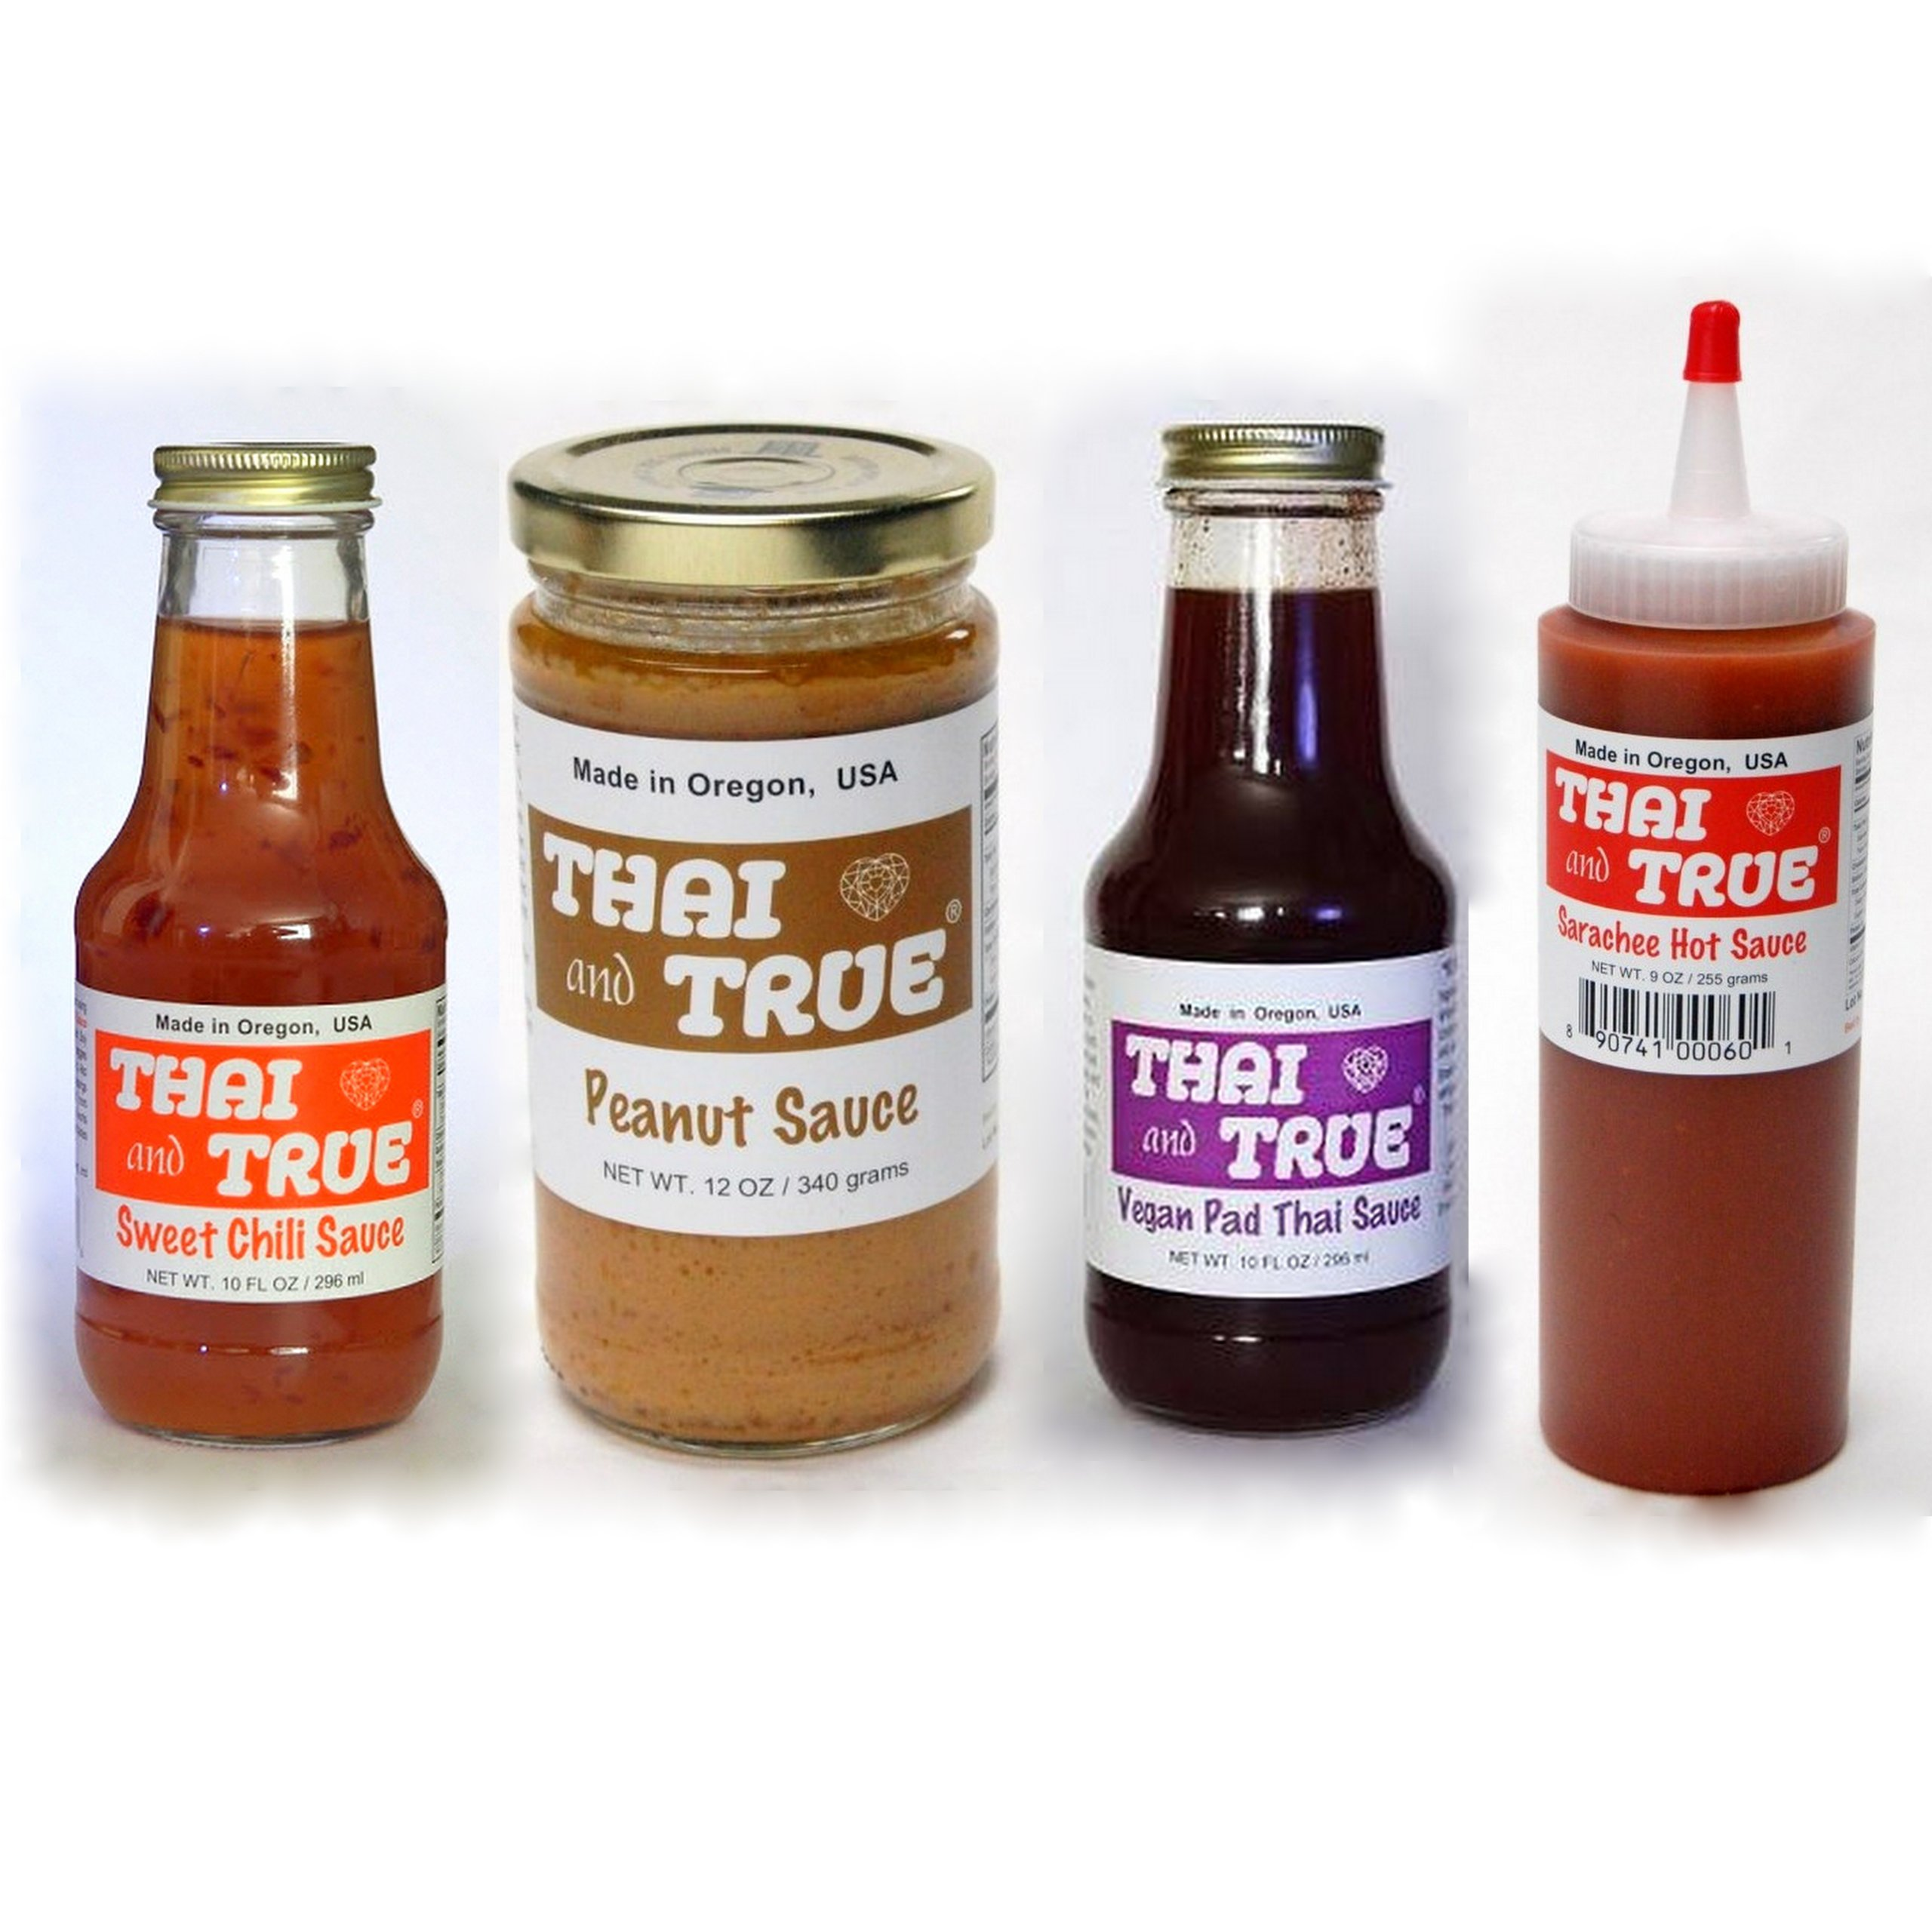 Thai and True Vegan Sauce Sampler - Peanut, Pad Thai, Sweet Chili, Sarachee by Thai and True